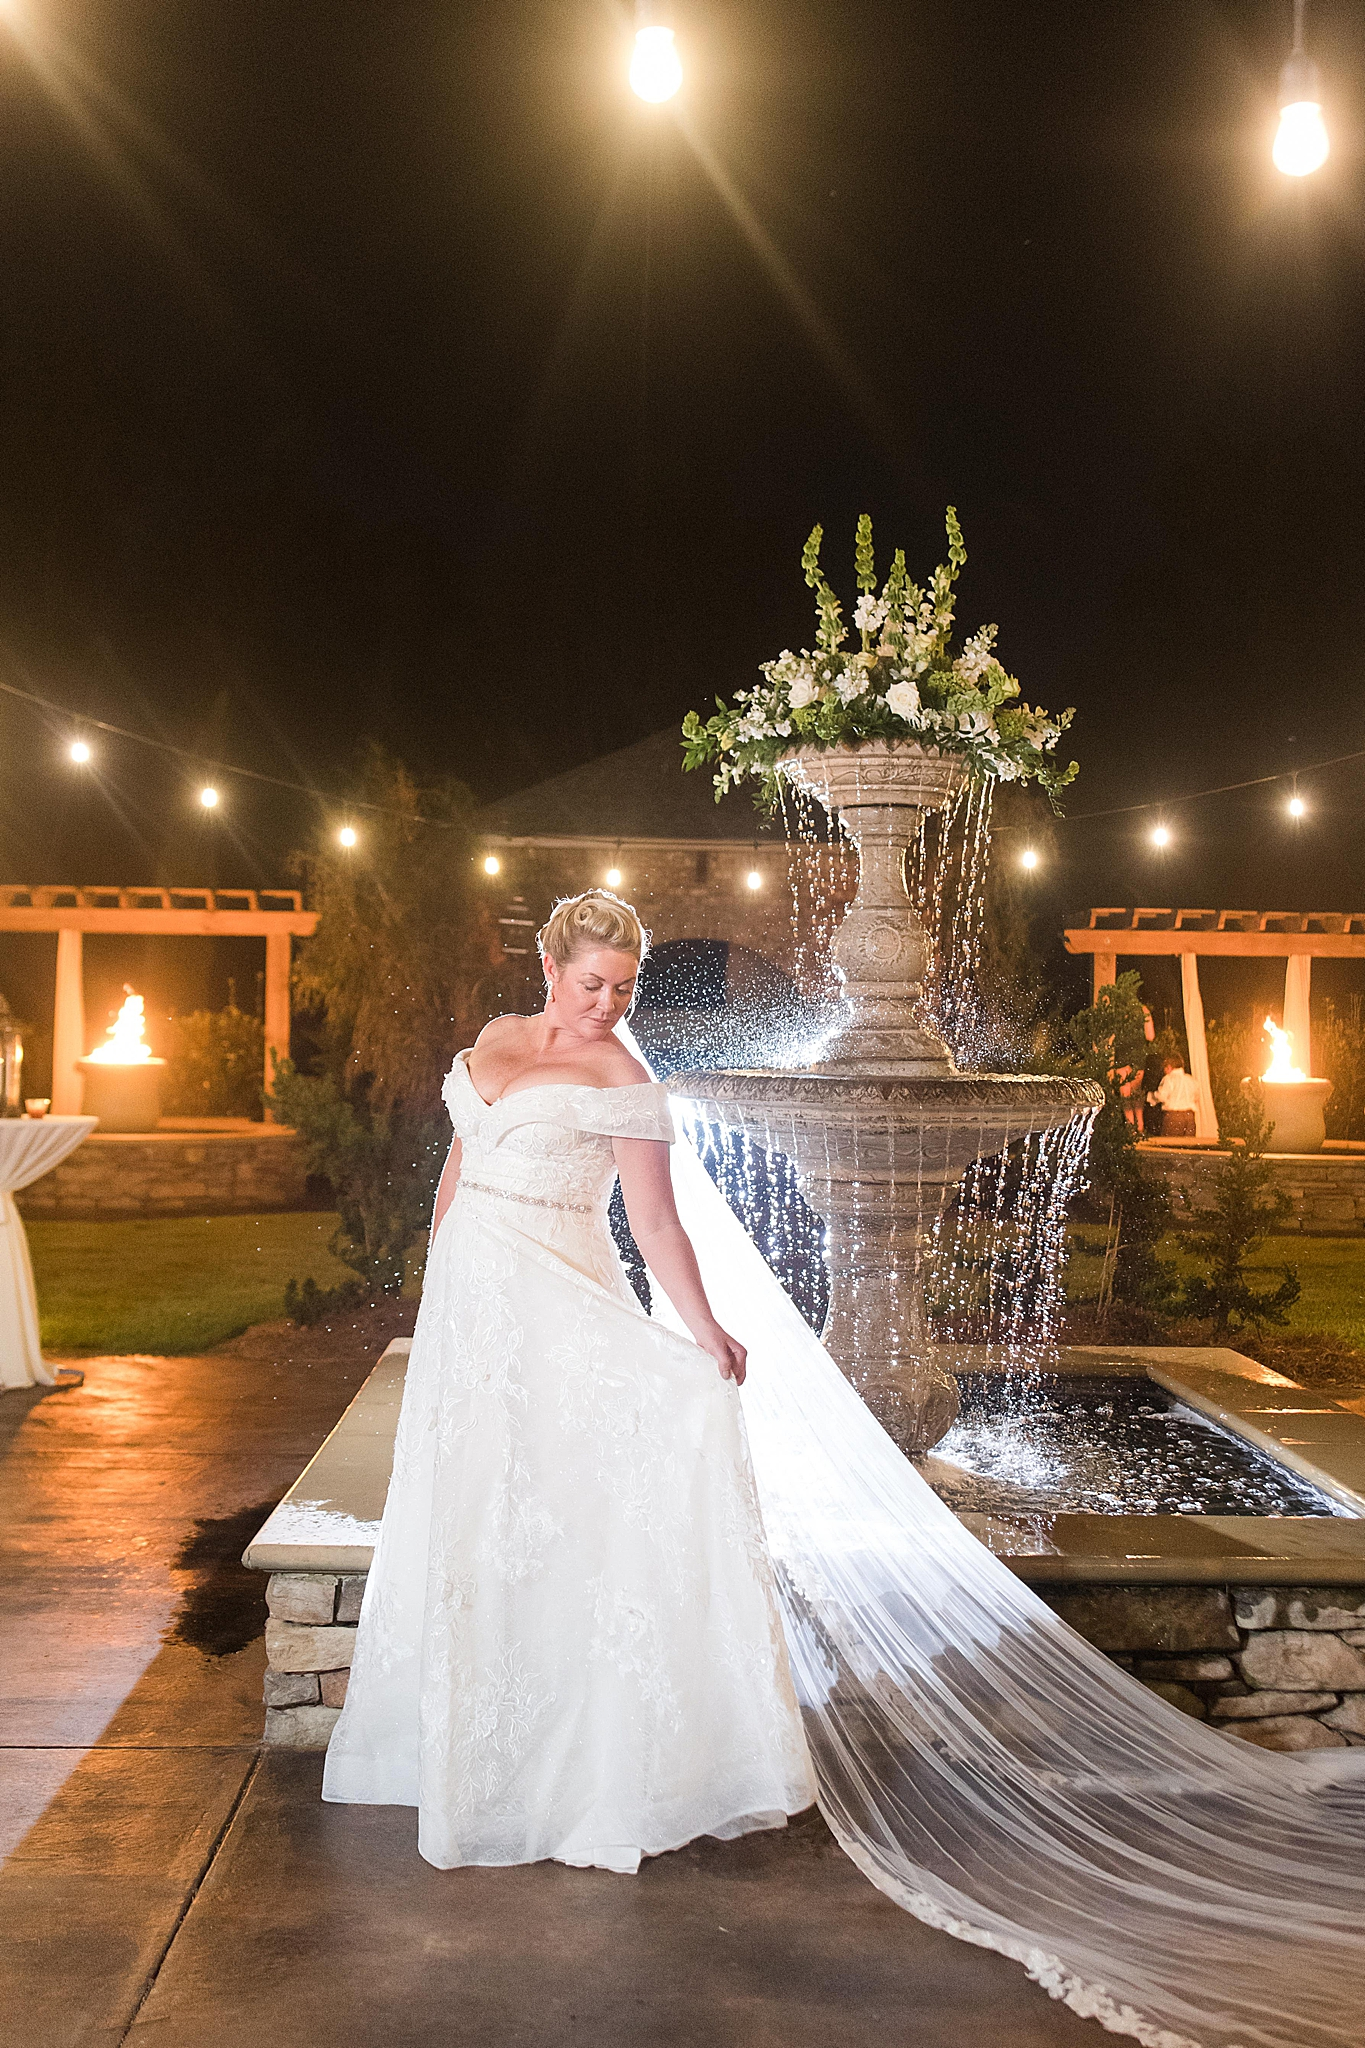 nighttime bridal portraits in courtyard at Bella Sera Gardens